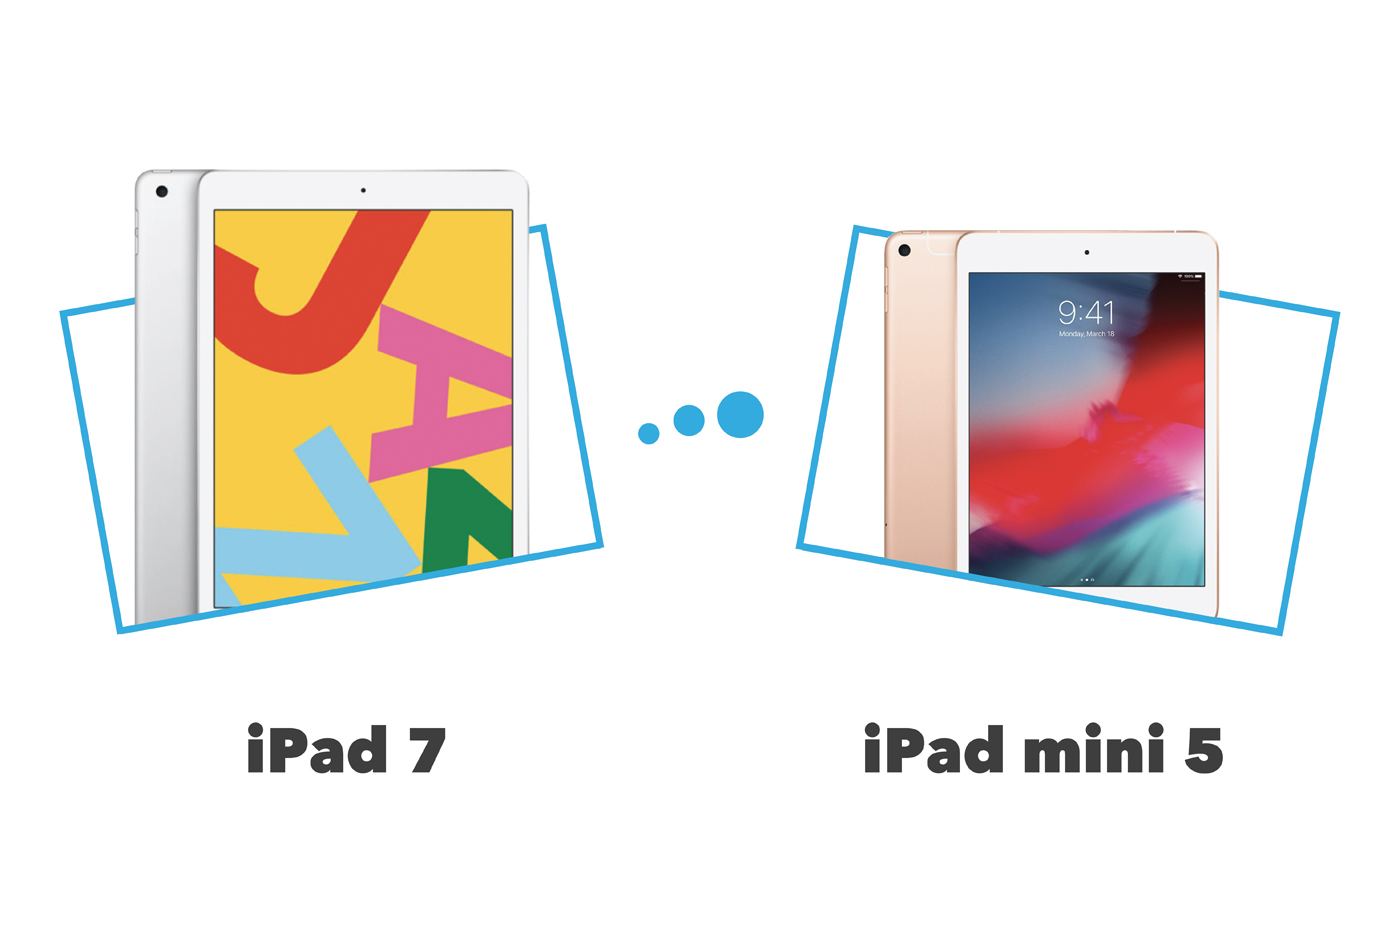 iPad mini vs iPad comparatif et différences